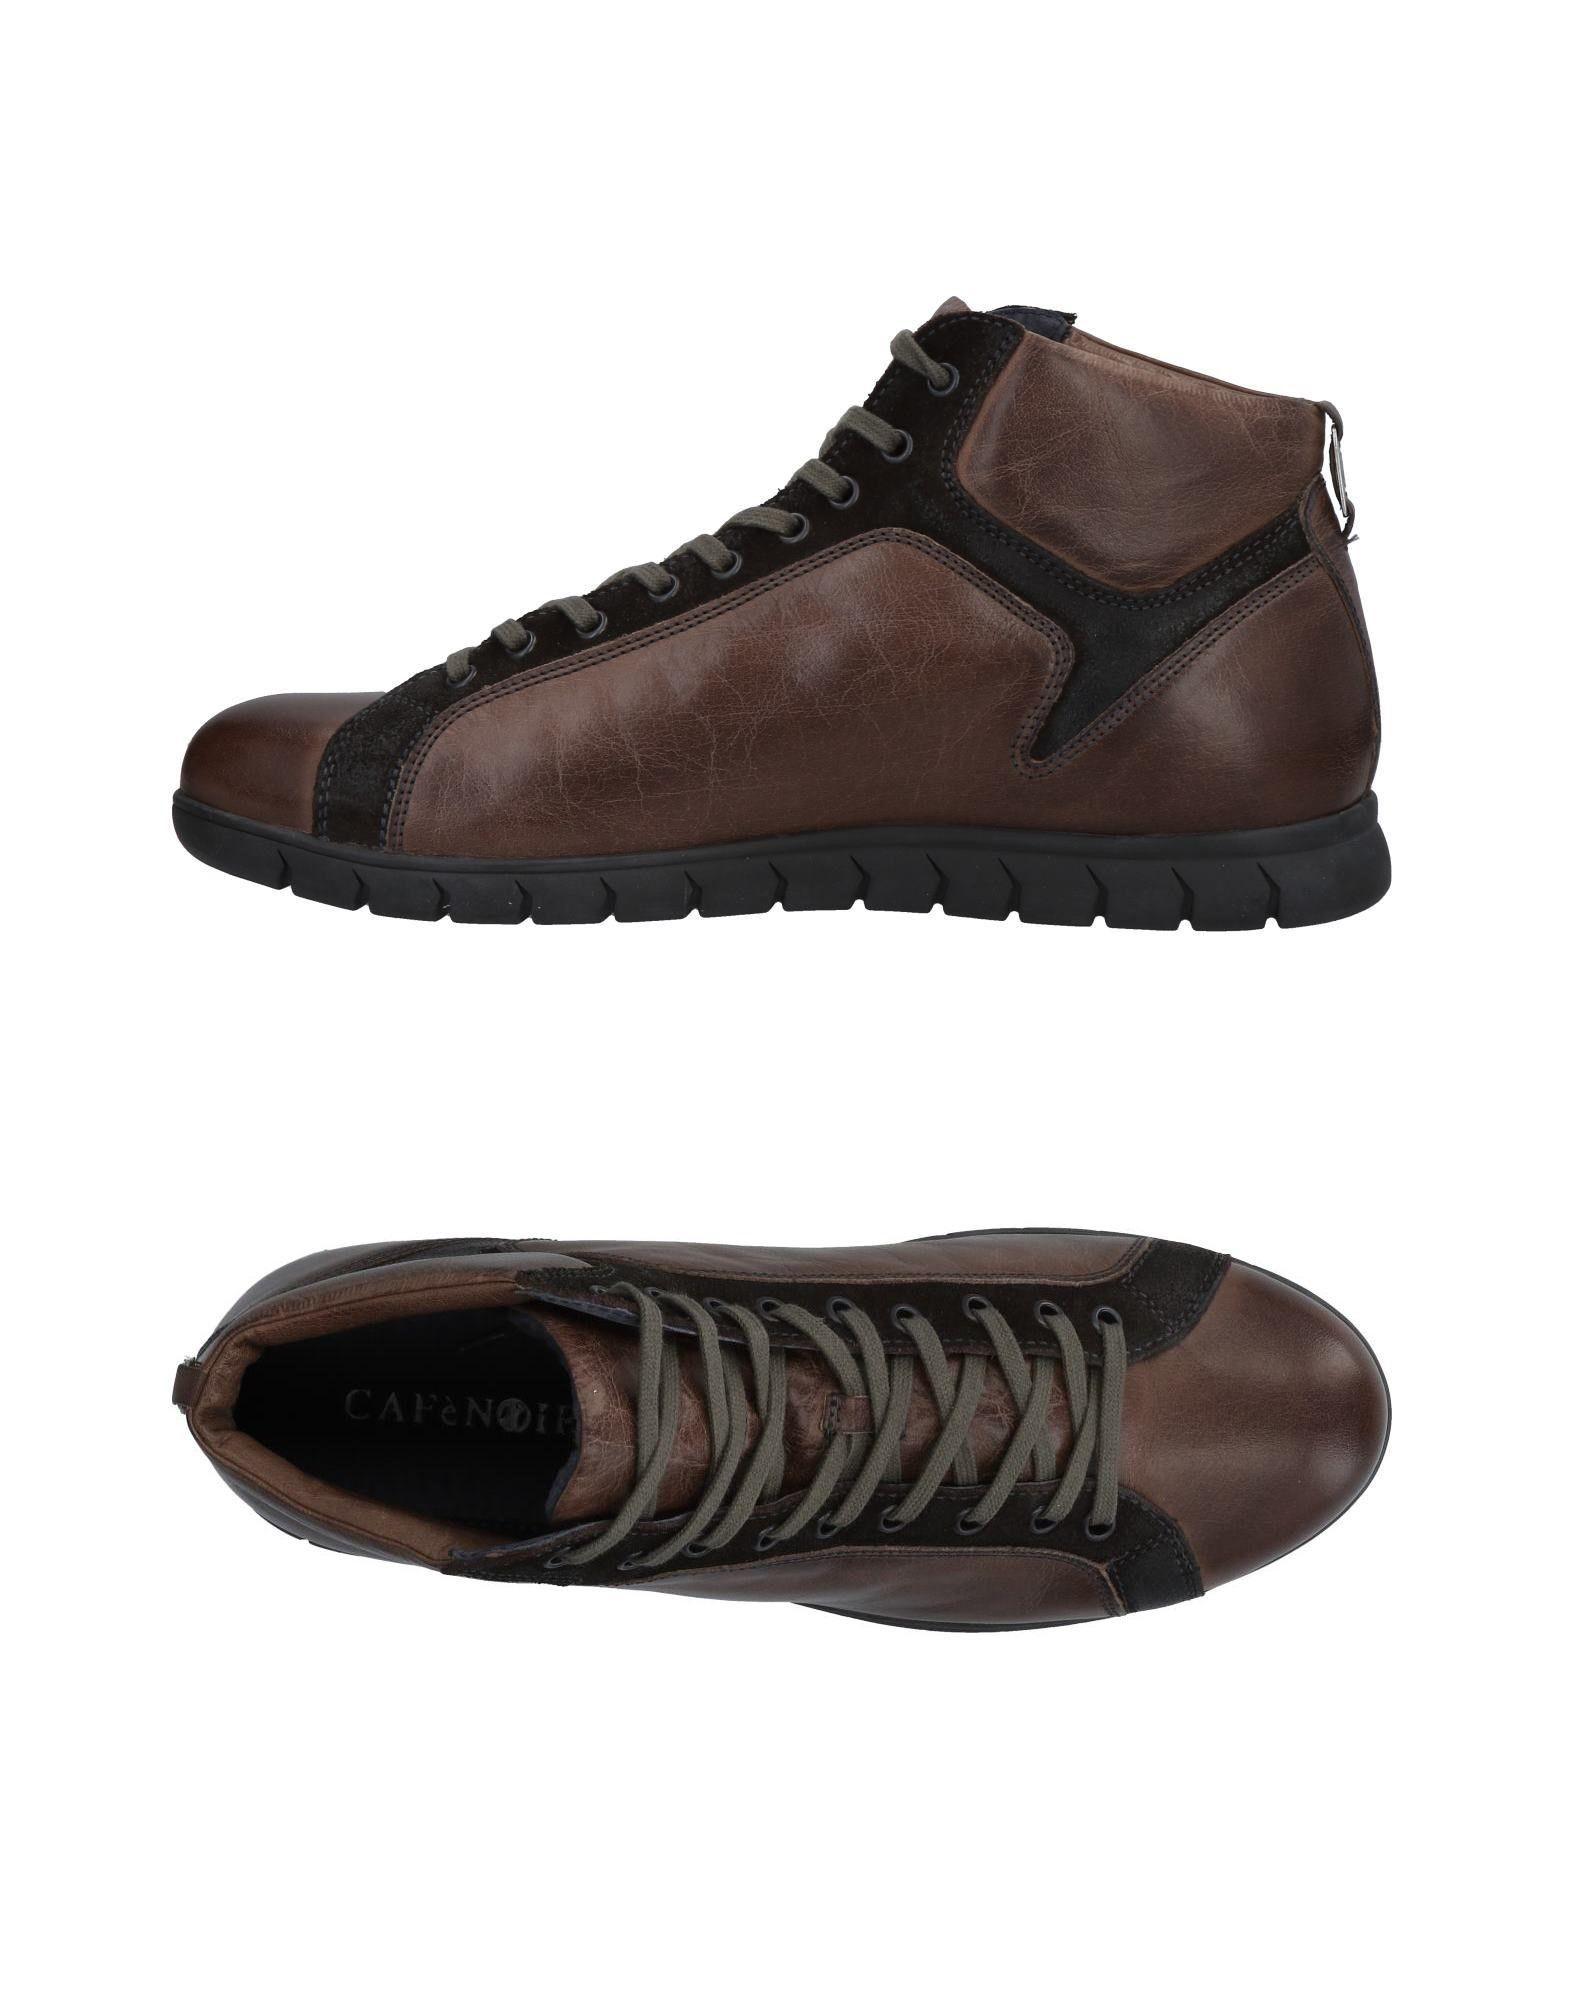 CAFèNOIR Высокие кеды и кроссовки кеды кроссовки высокие dc council mid tx stone camo